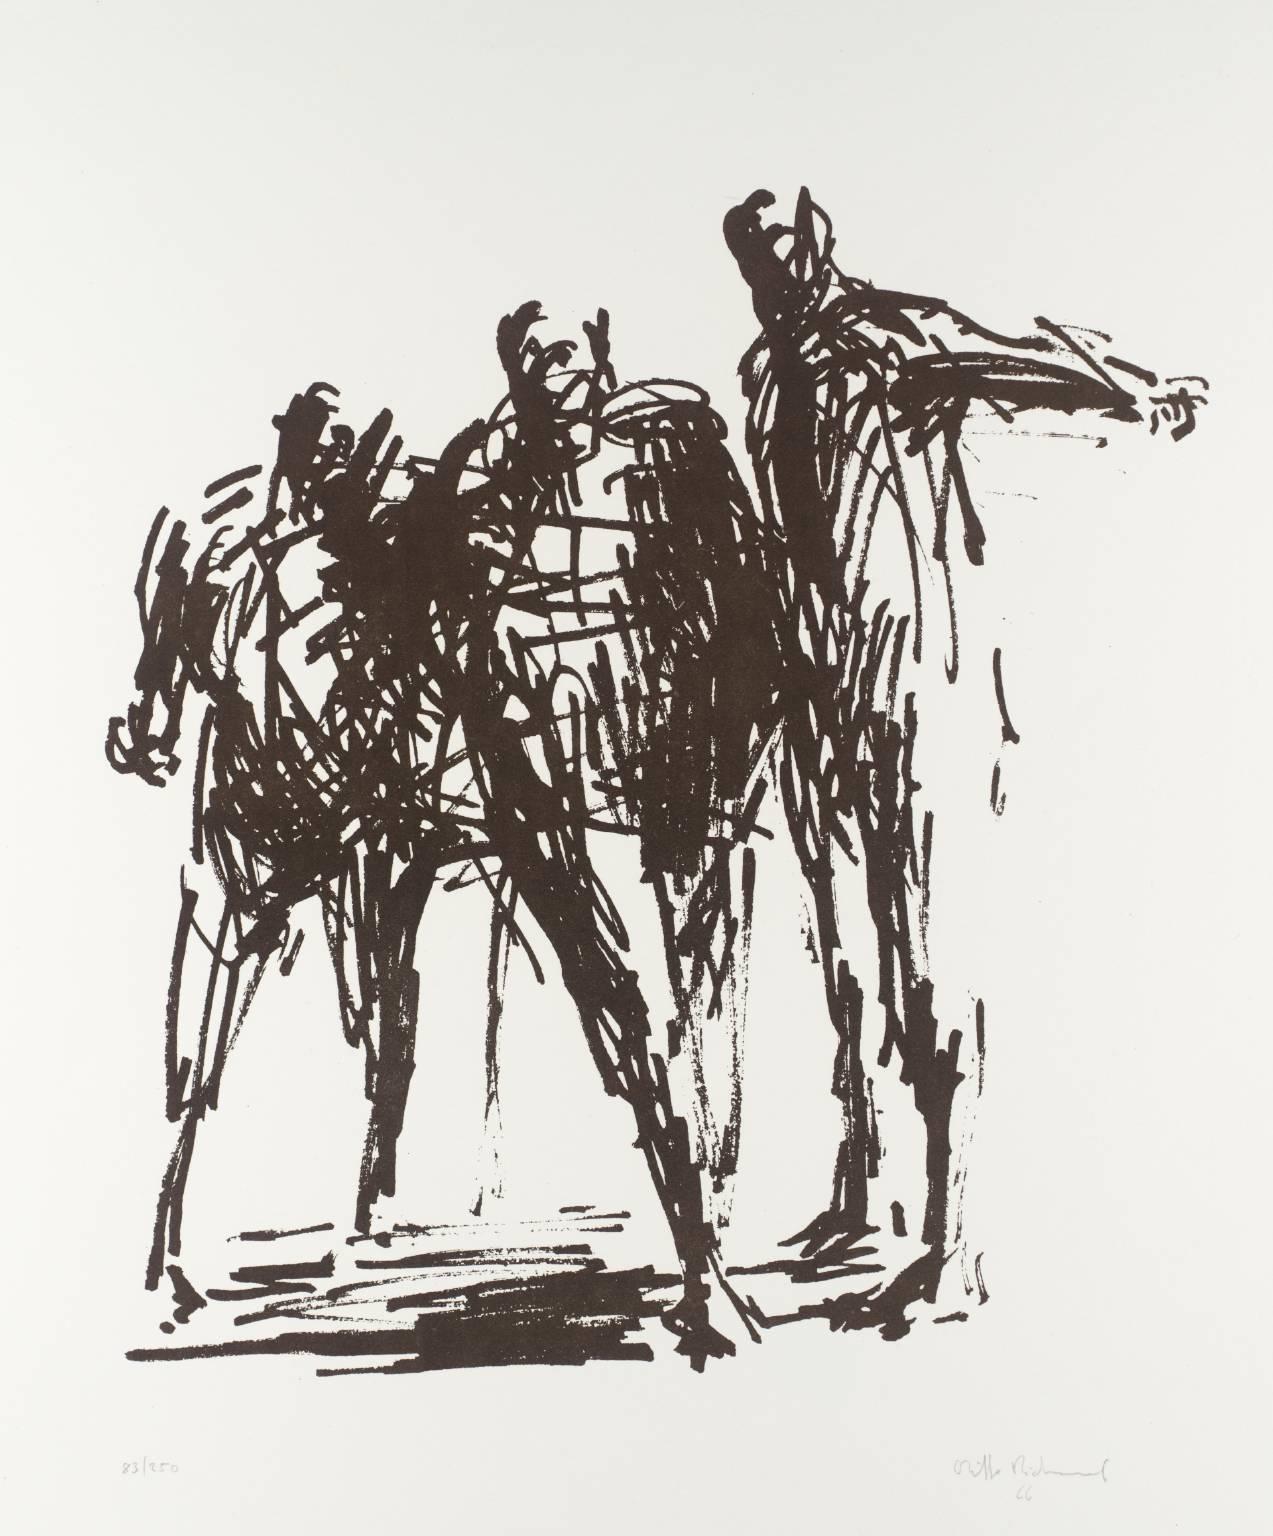 OLIFFE RICHMOND [1919-1977]. Pilot; Marathon; Standing Group, 1966. The set of three lithographs,